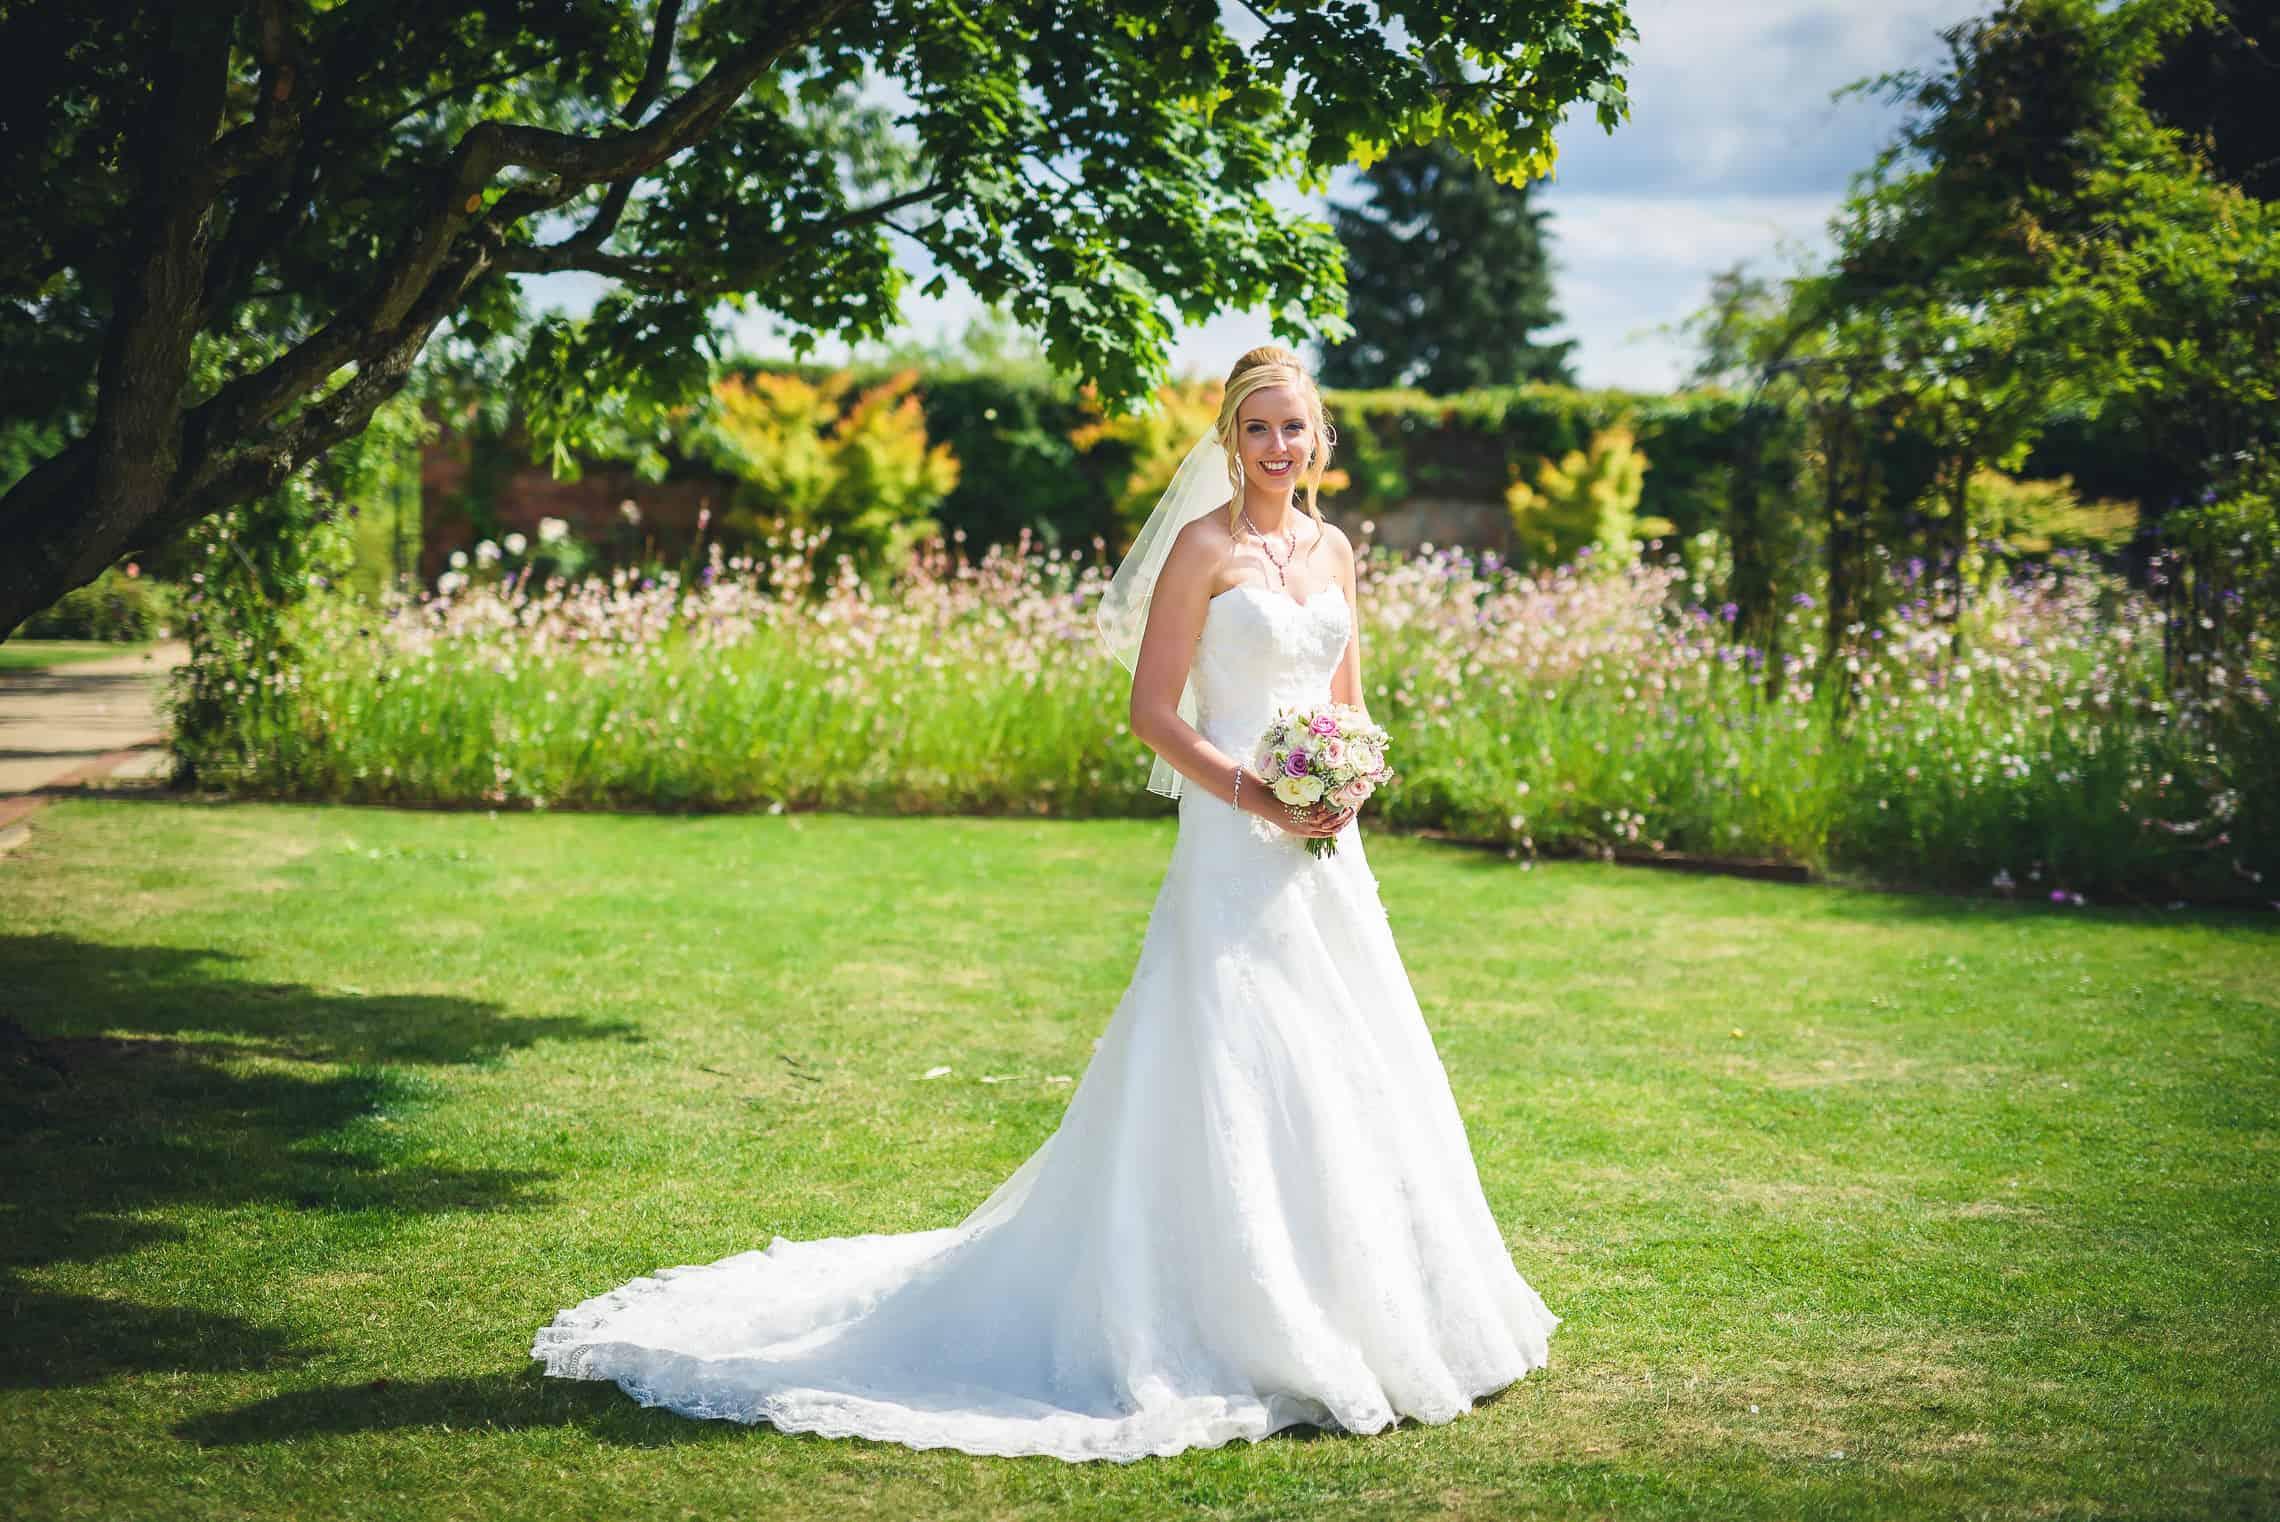 gaynes_park_wedding_lm_justin_bailey_photography_011